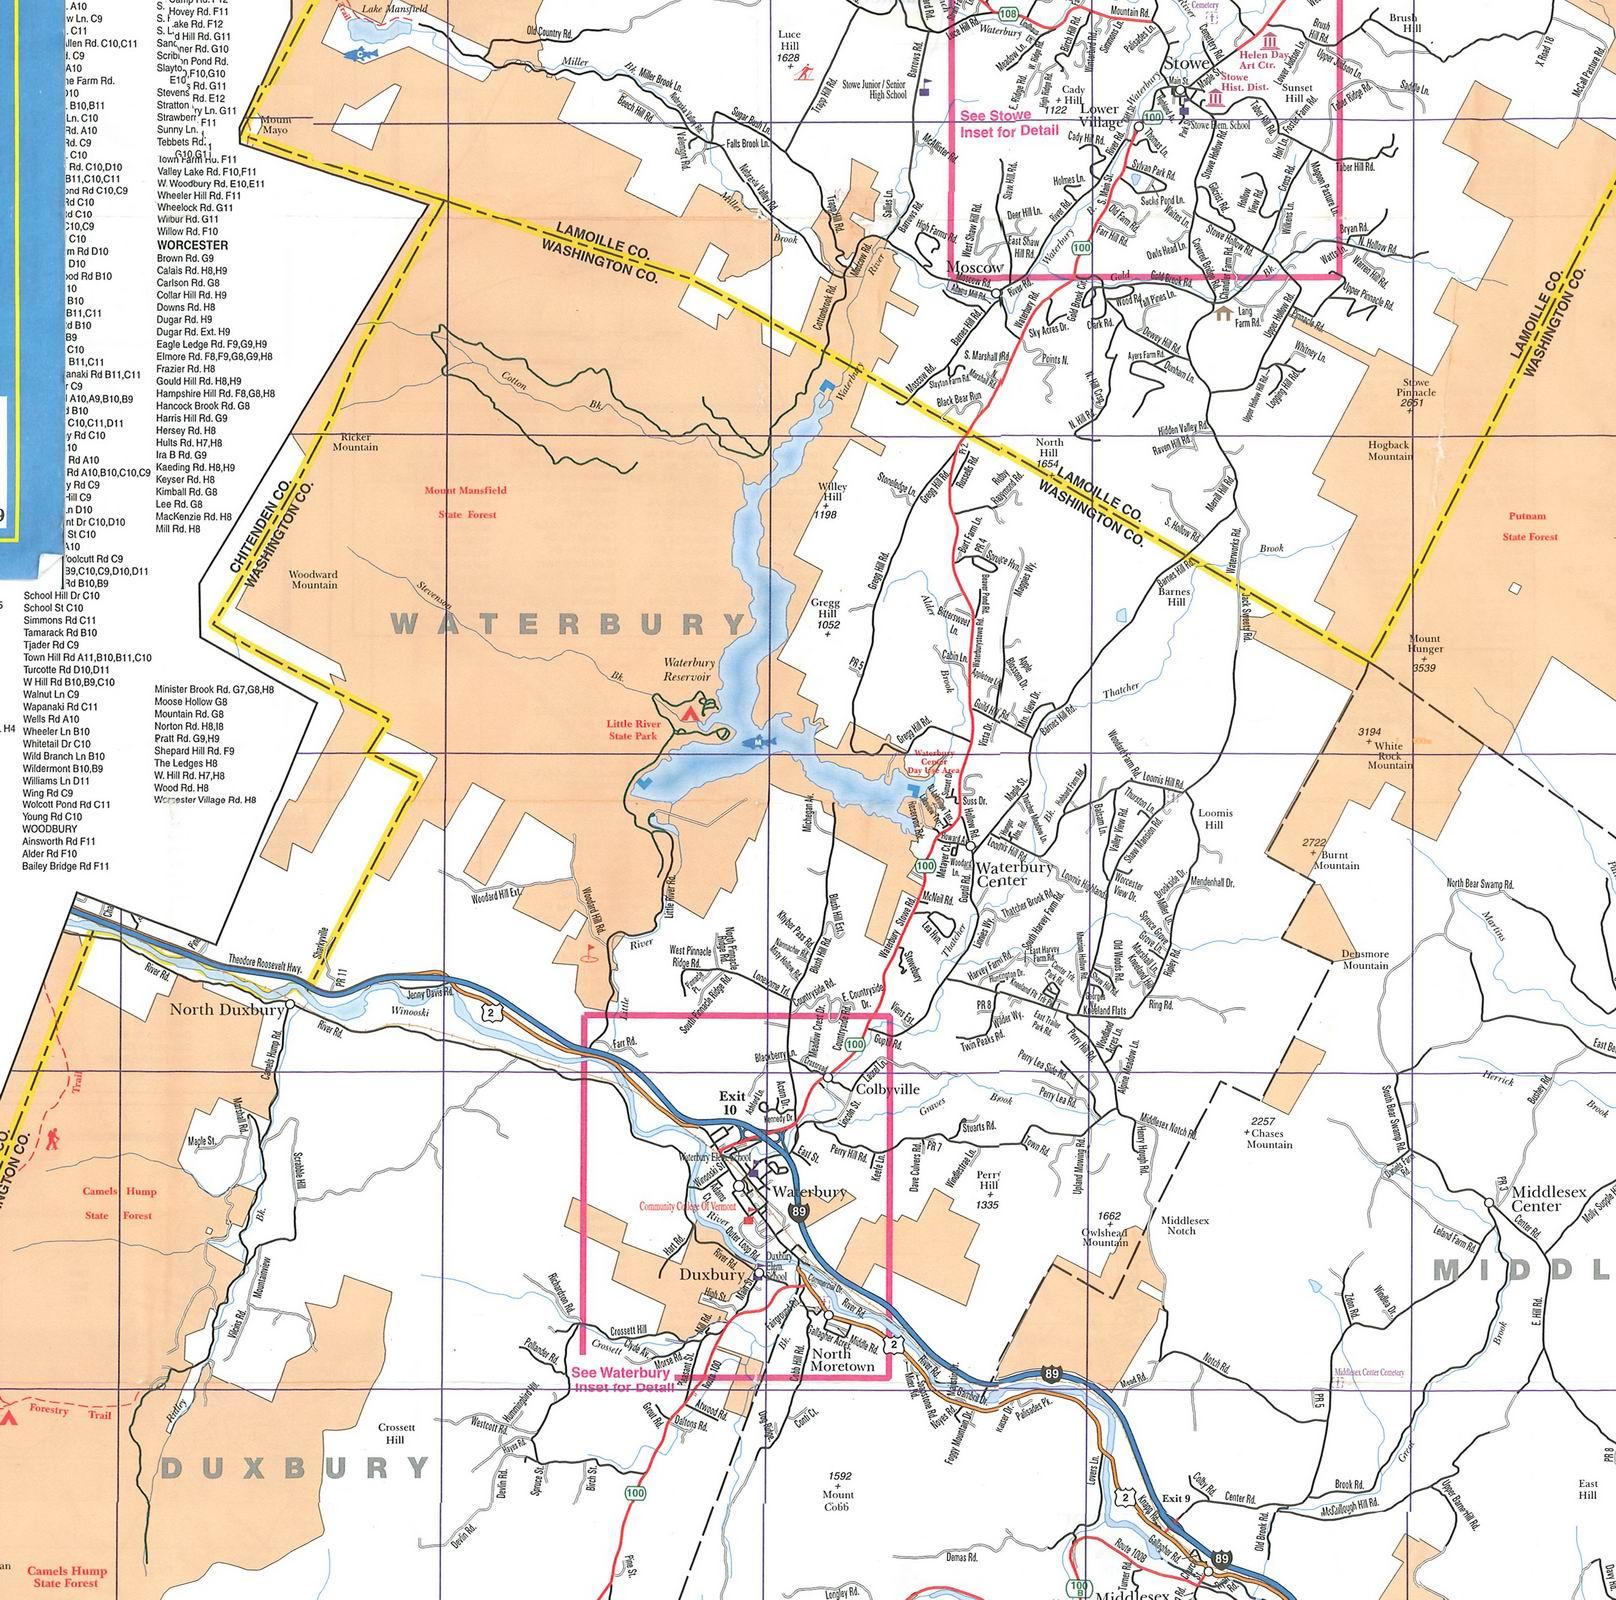 Directory Vermontvt_townsWashingtonCo